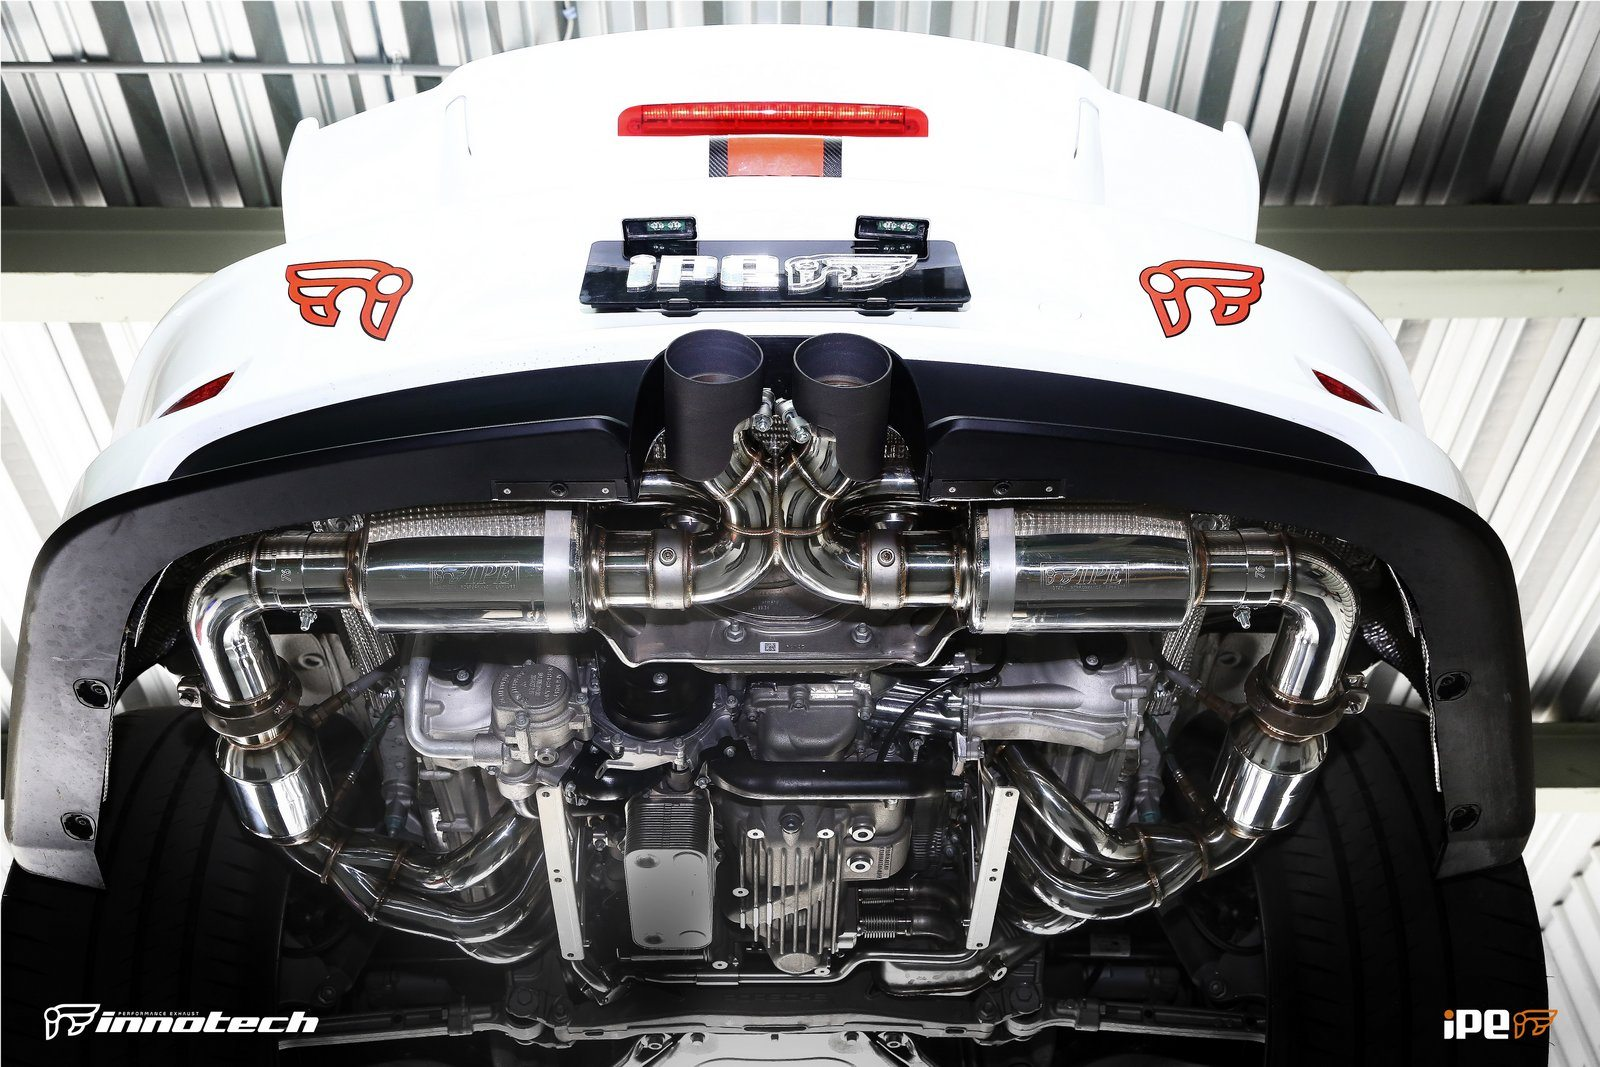 Porsche 991 GT3 - www.hartvoorautos.nl